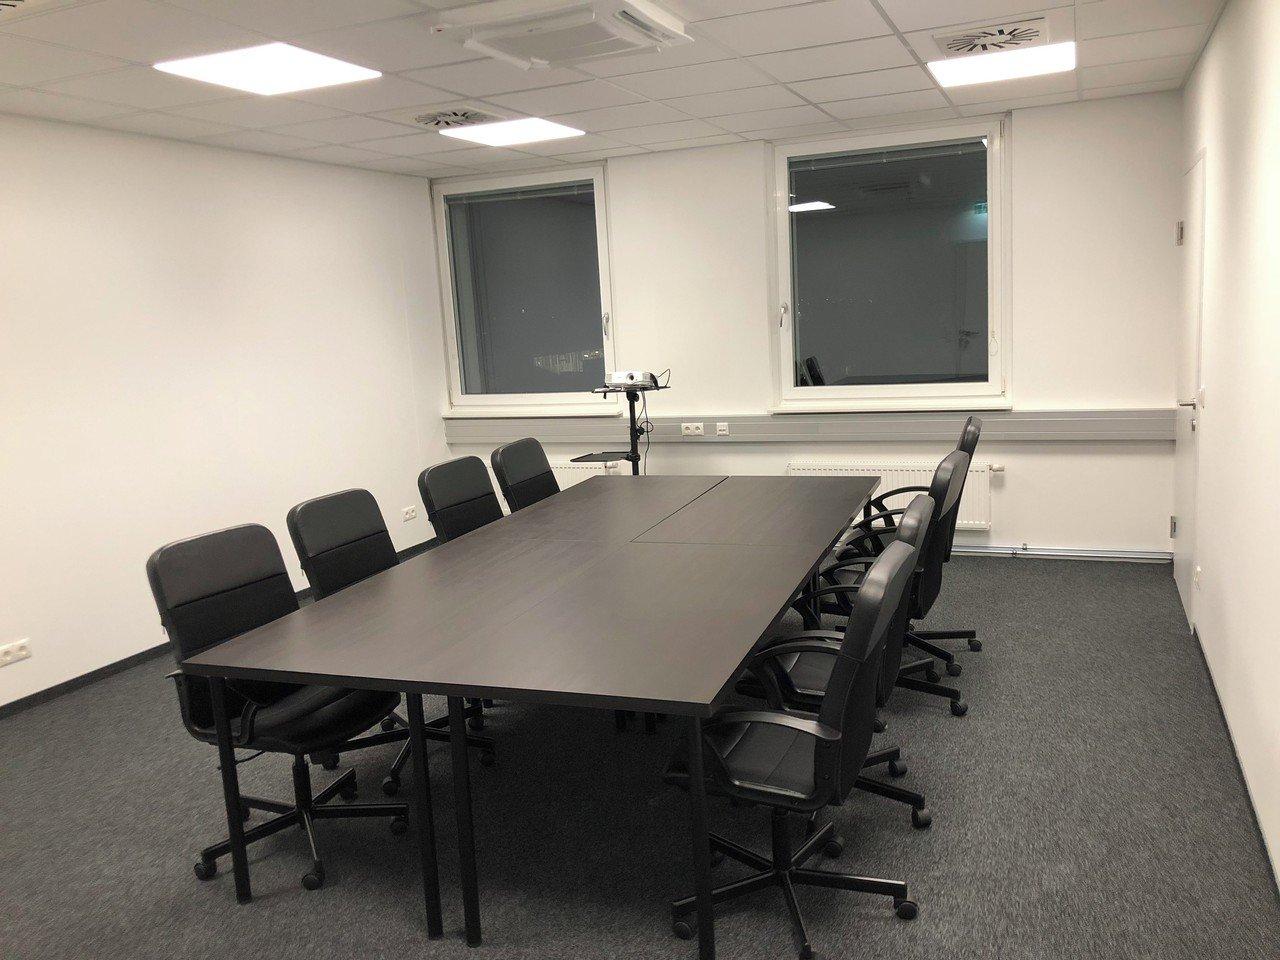 Vienna  Salle de réunion Brainobrain image 0